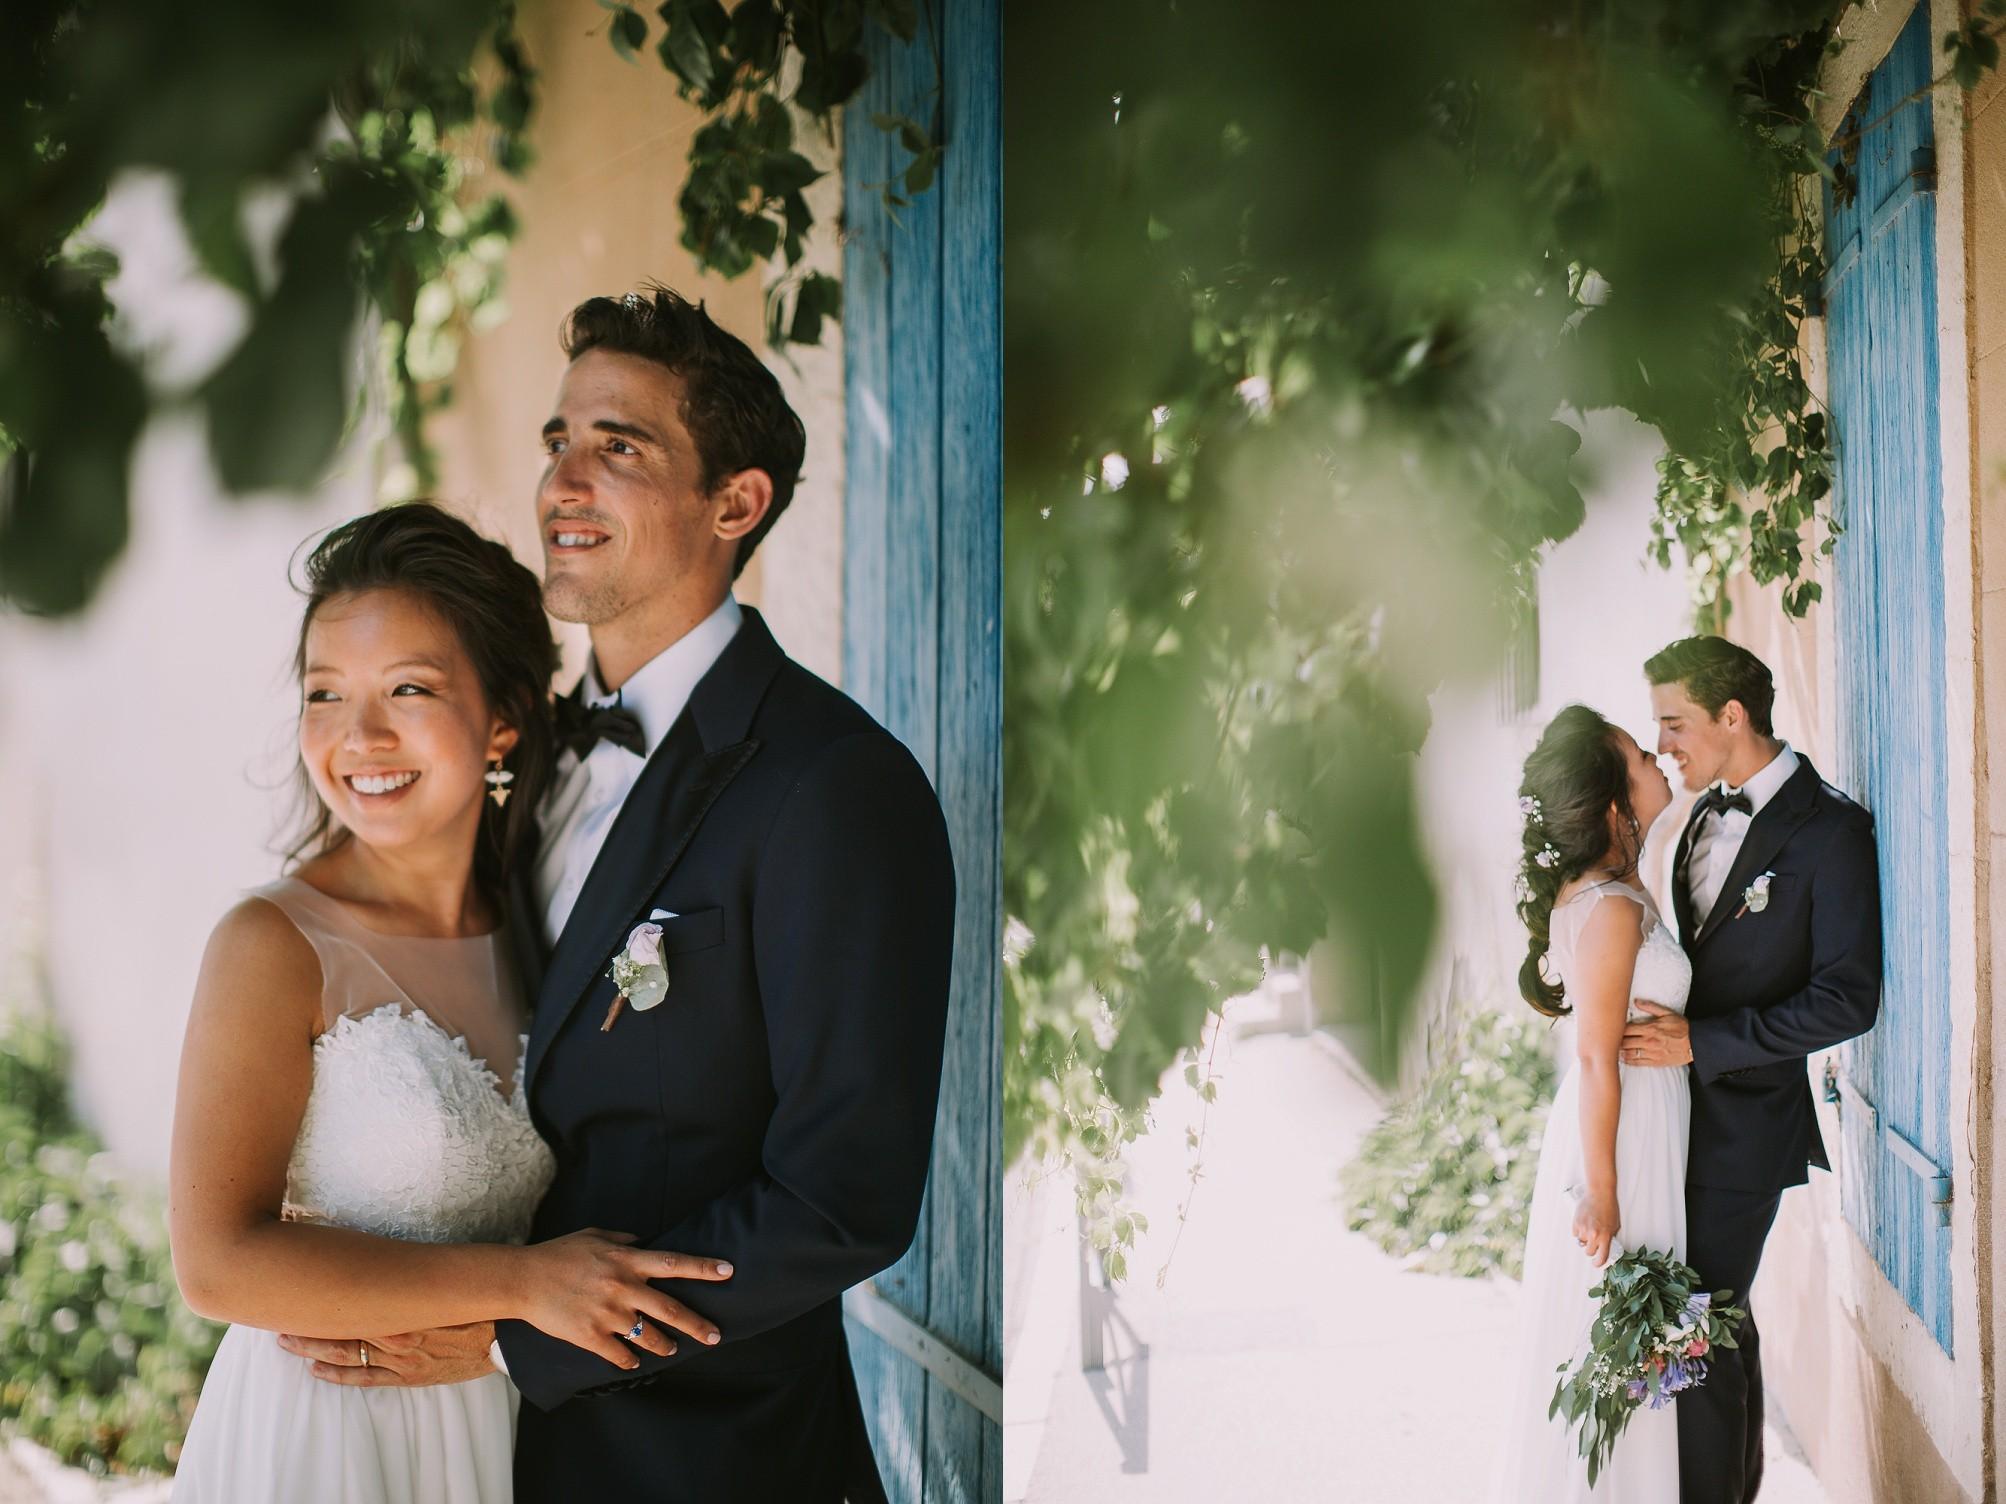 katerynaphotos-mariage-photographe-puyloubier-provence-aix-en-provence-sud-de-la-france_0375.jpg